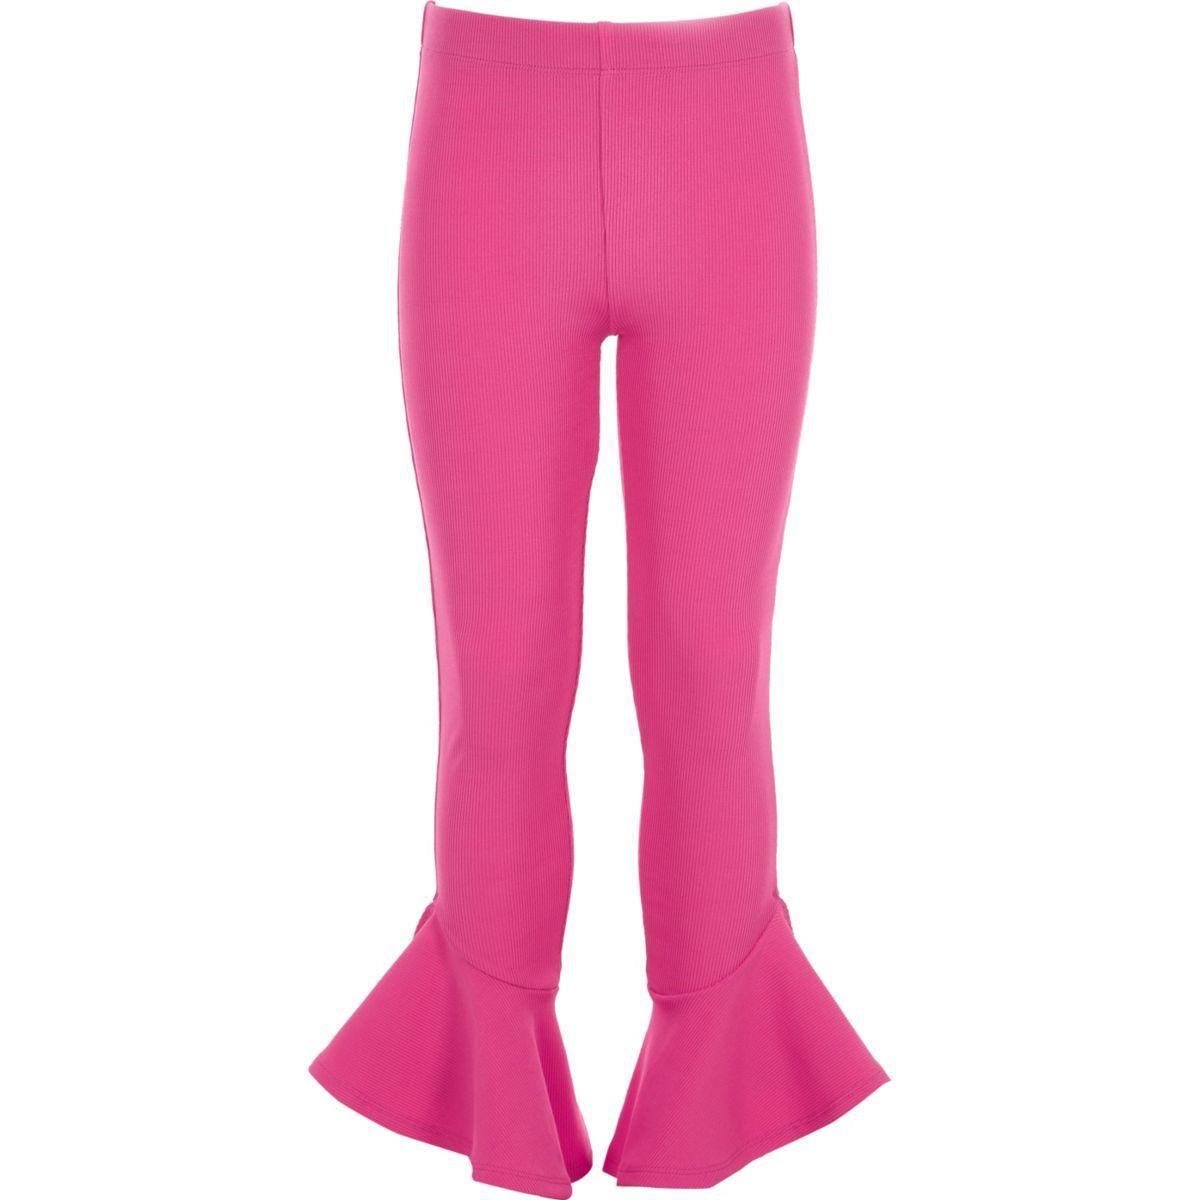 Pinke Leggings mit Rüschensaum